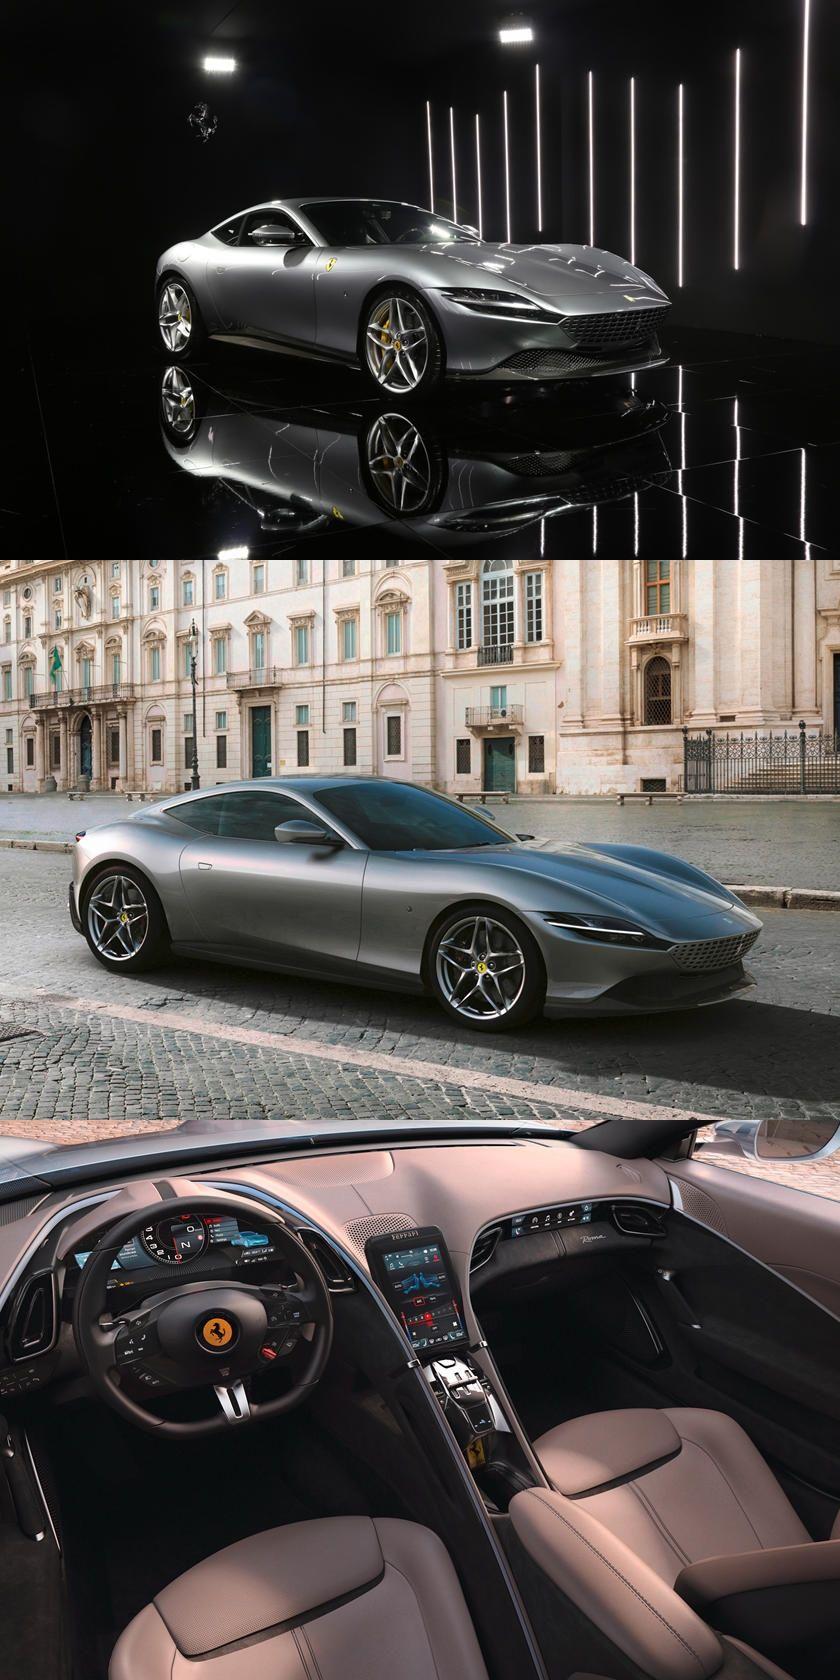 Ferrari Sheds More Light On Exquisite Roma